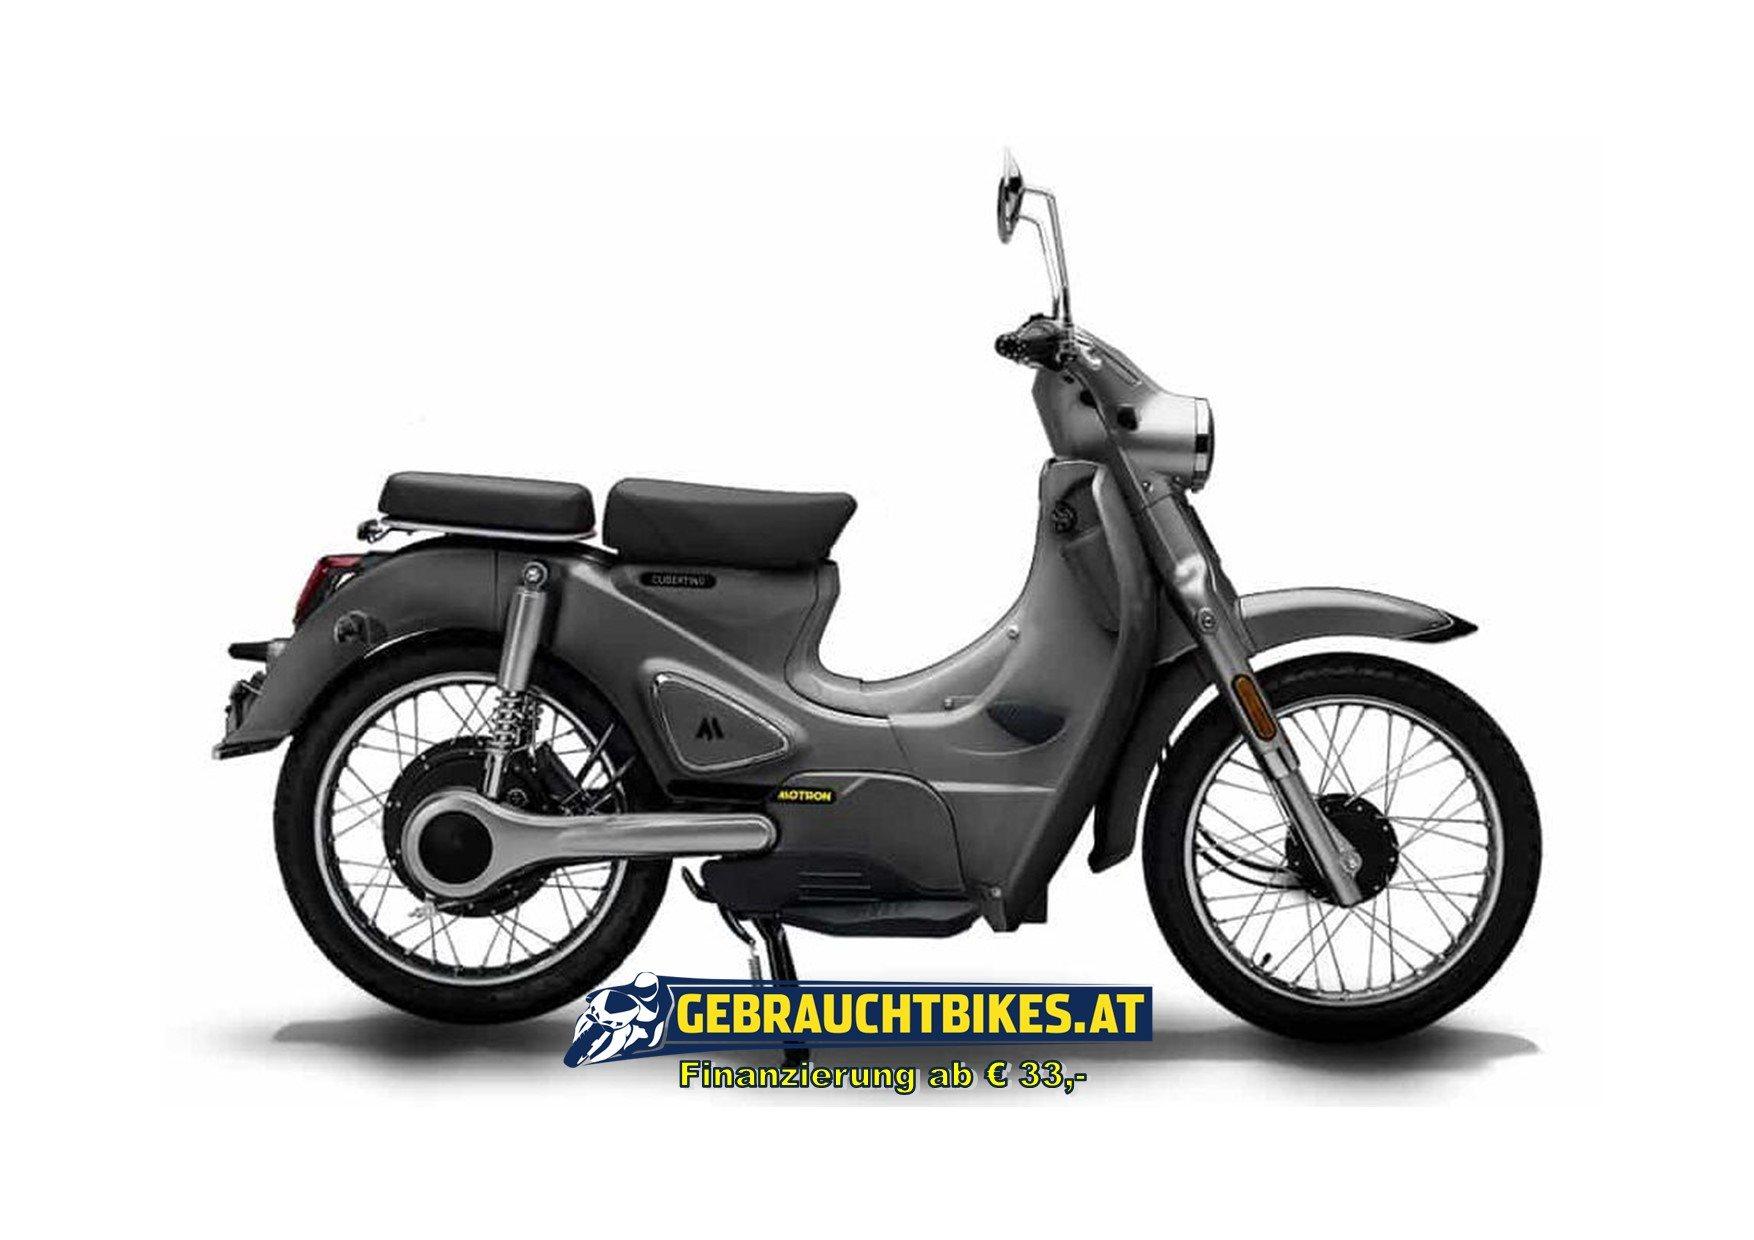 Motron Cubertino Motorrad, neu